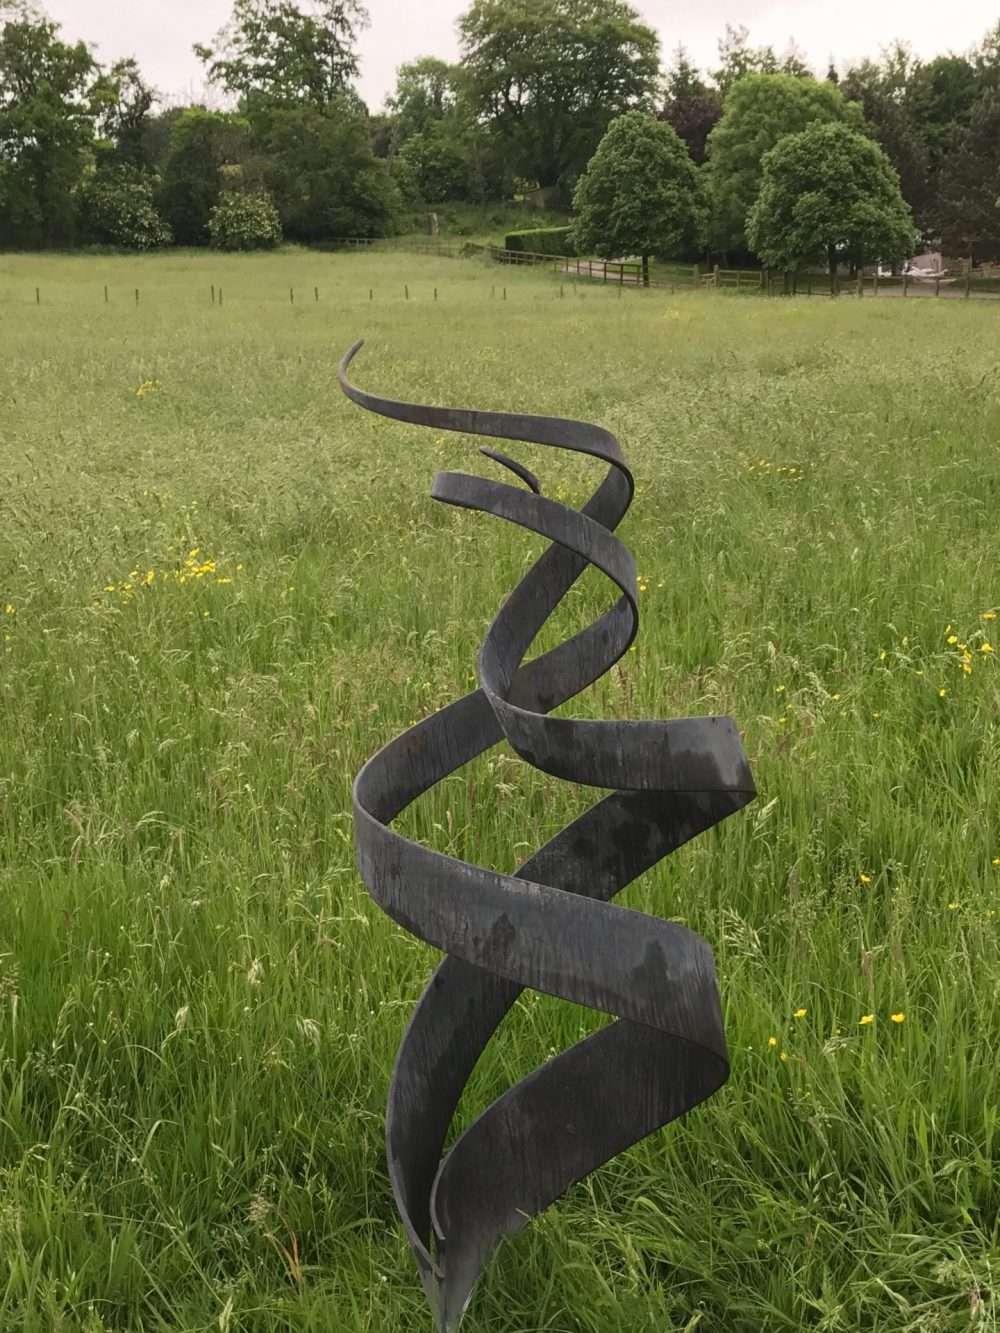 Spiral Abstract Sculpture At Dusk